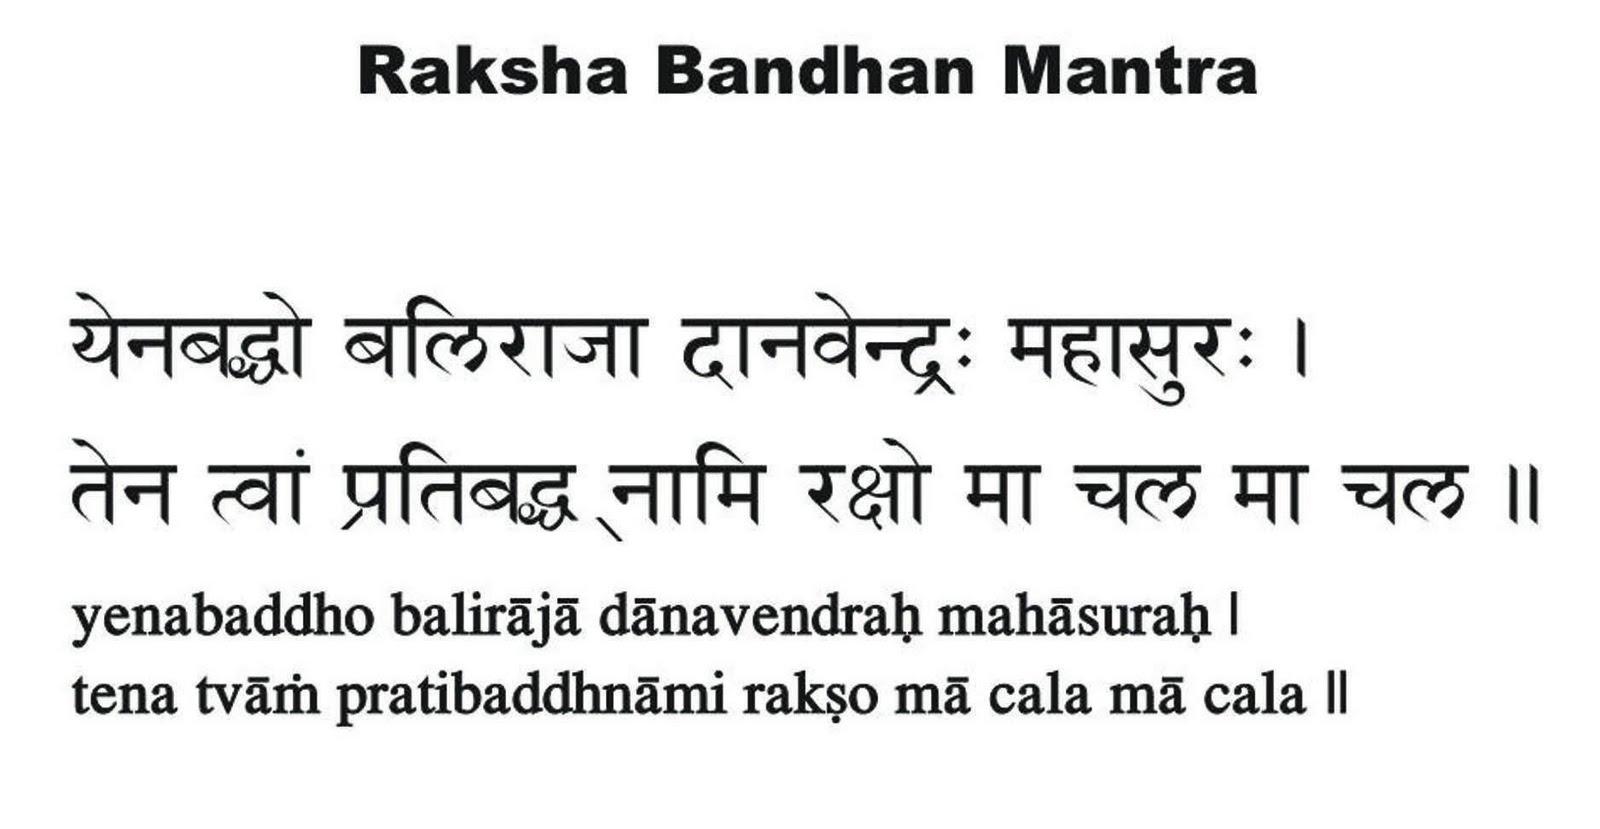 rakshabandhan essay in sanskrit Sanskrit essay on rakshabandhan, sanskrit, , , translation, human translation, automatic translation.